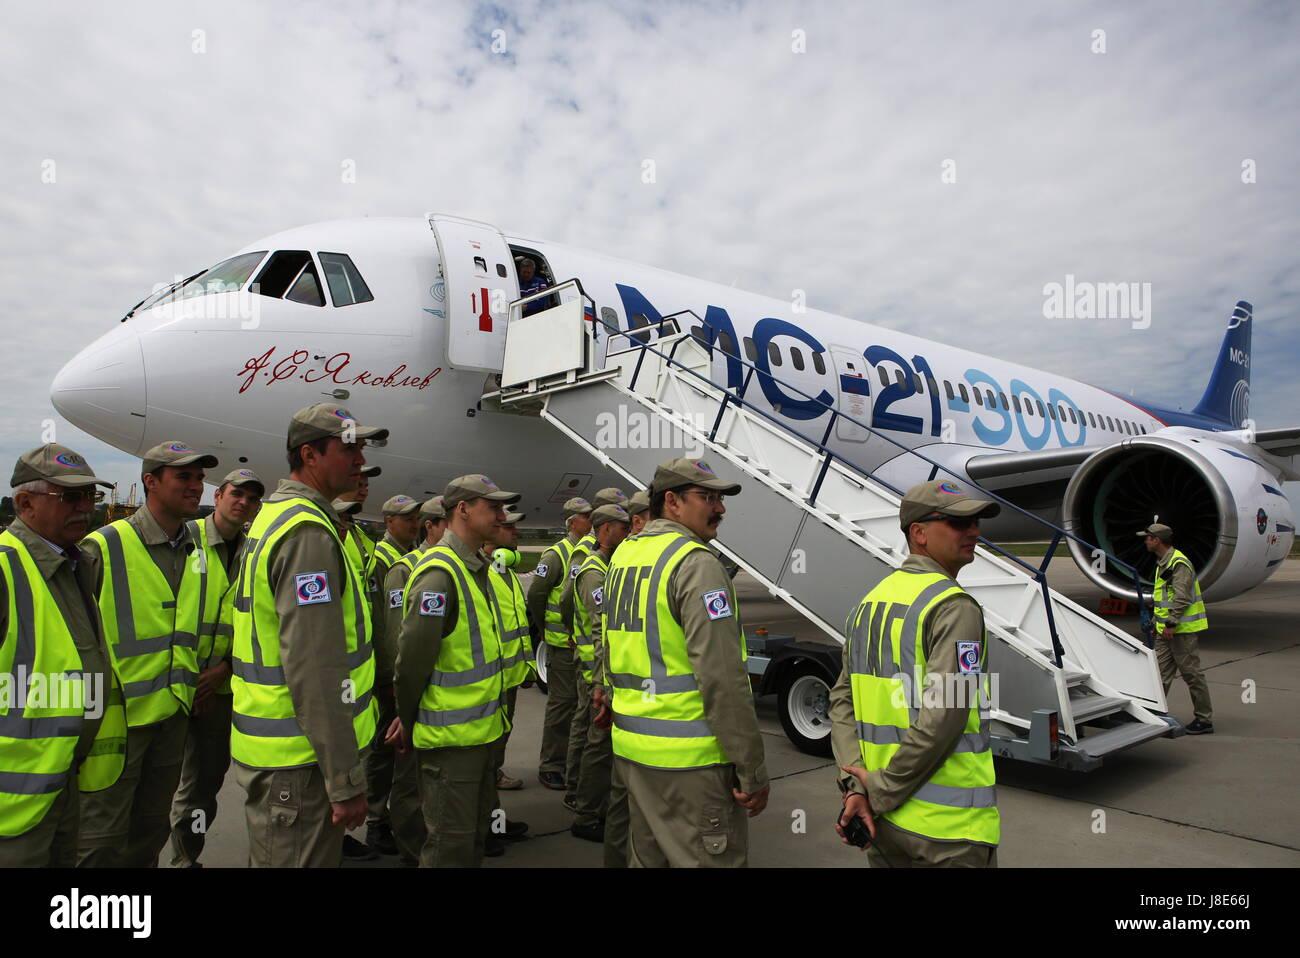 Irkutsk, Russia. 28th May, 2017. A new Russian-made Irkut MC-21-300 twinjet airliner after its first test flight - Stock Image